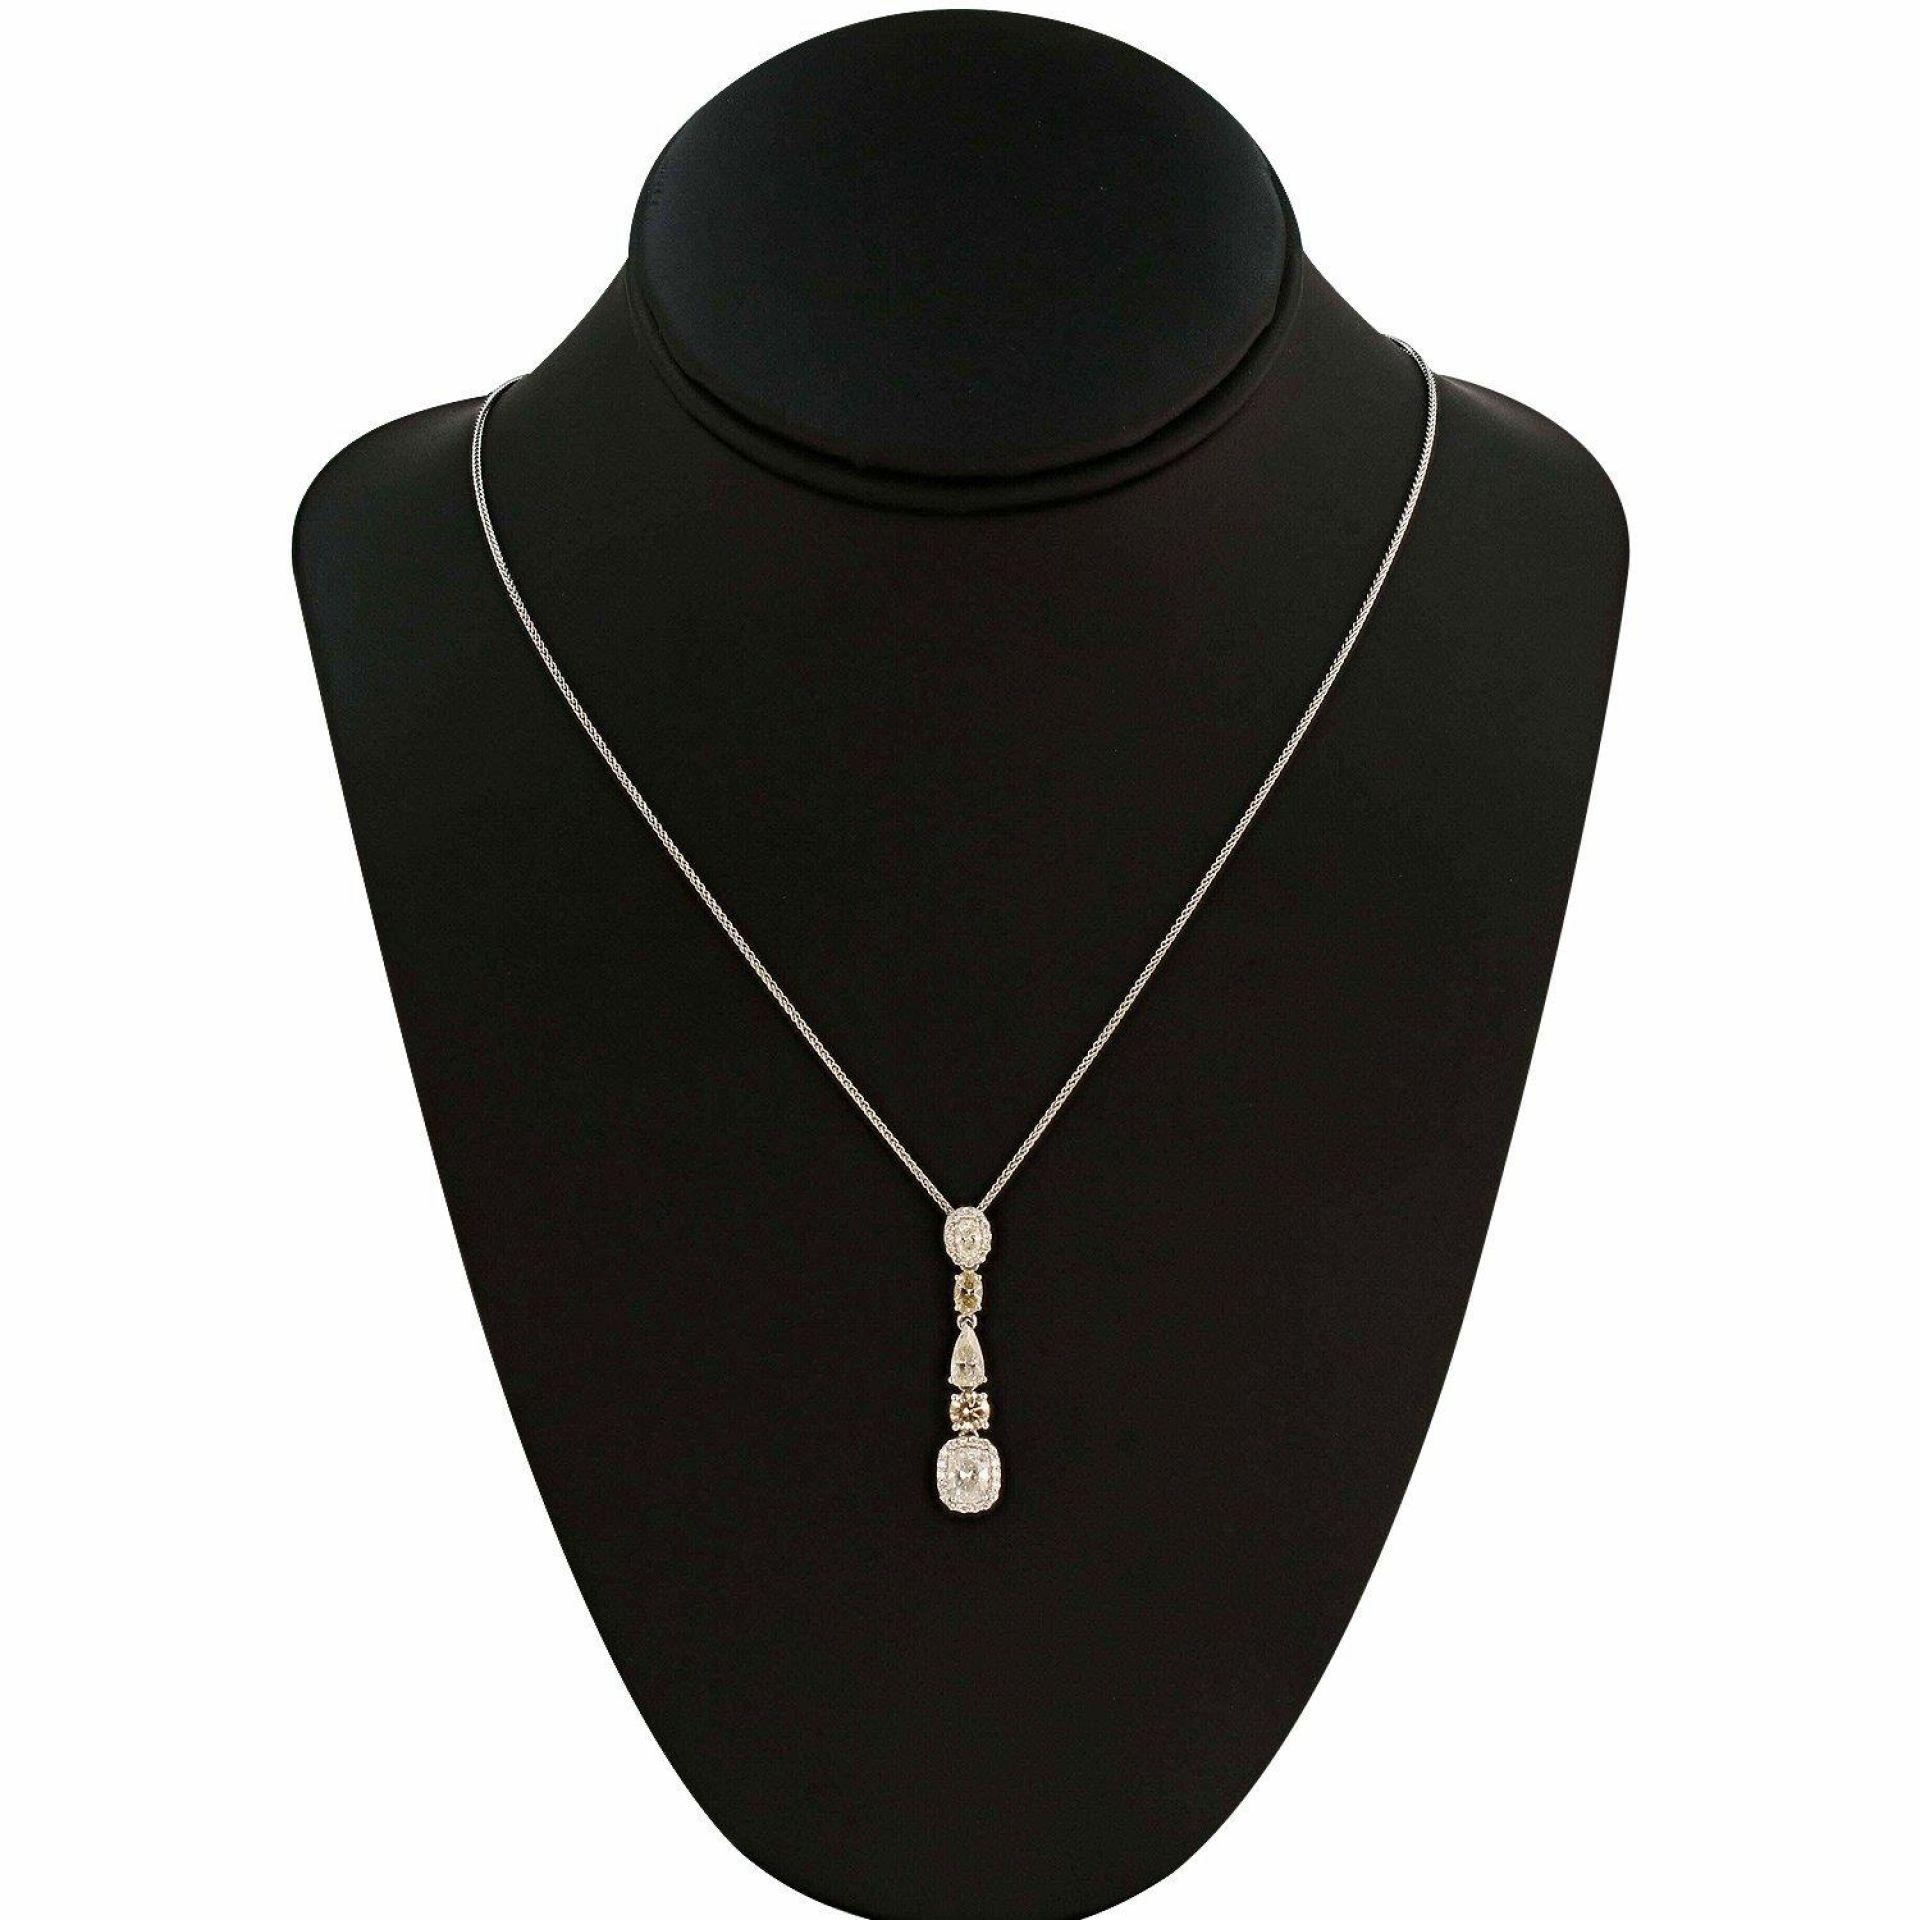 2.39ctw Diamond 18K White Gold Pendant/Necklace